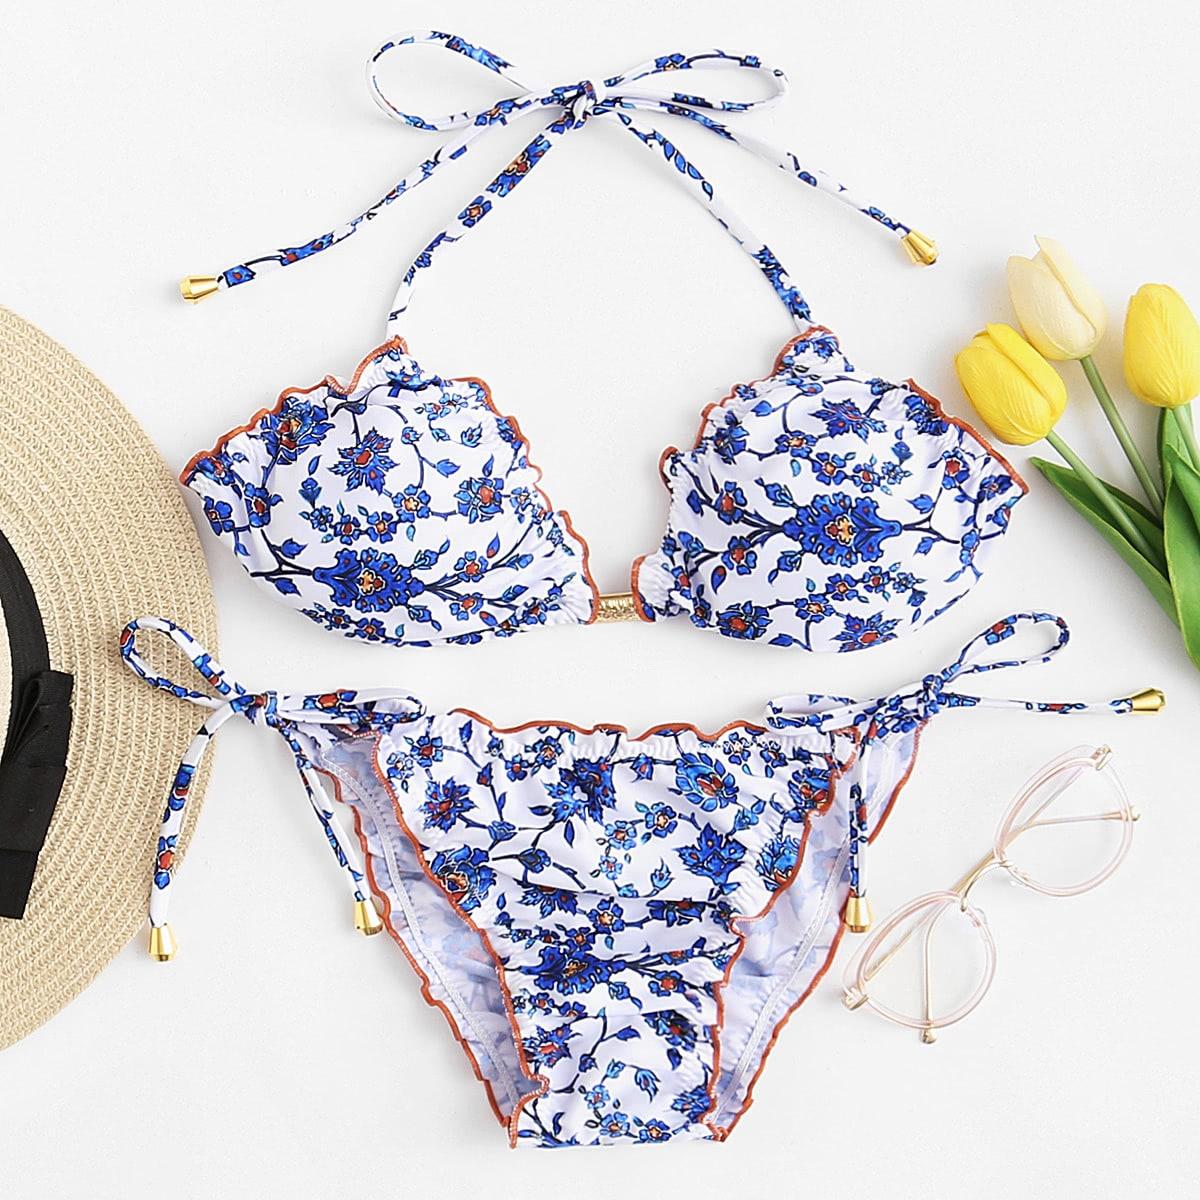 Calico Print Lettuce Bikini Set